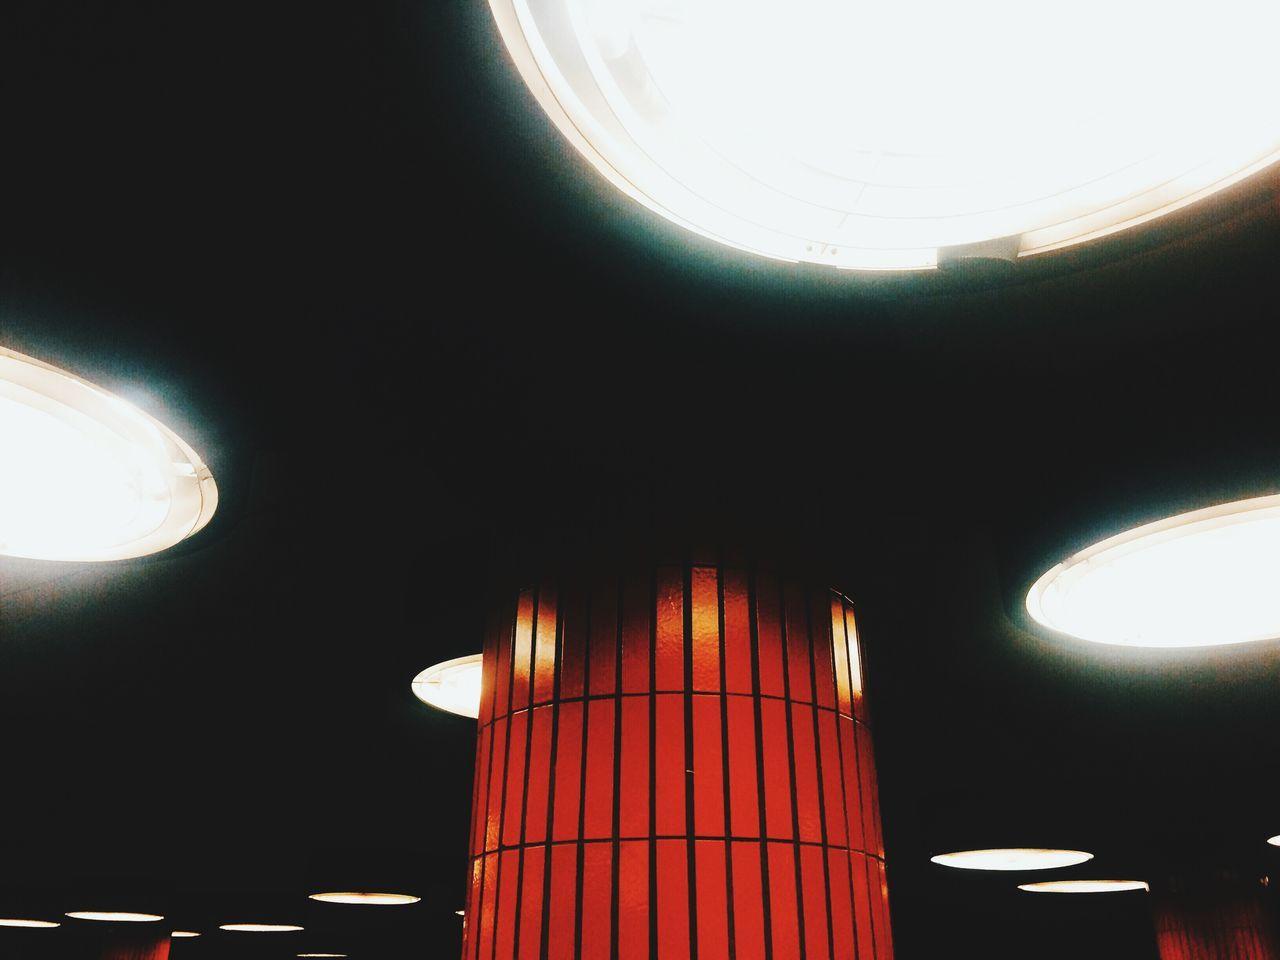 Illuminated Lights On Ceiling